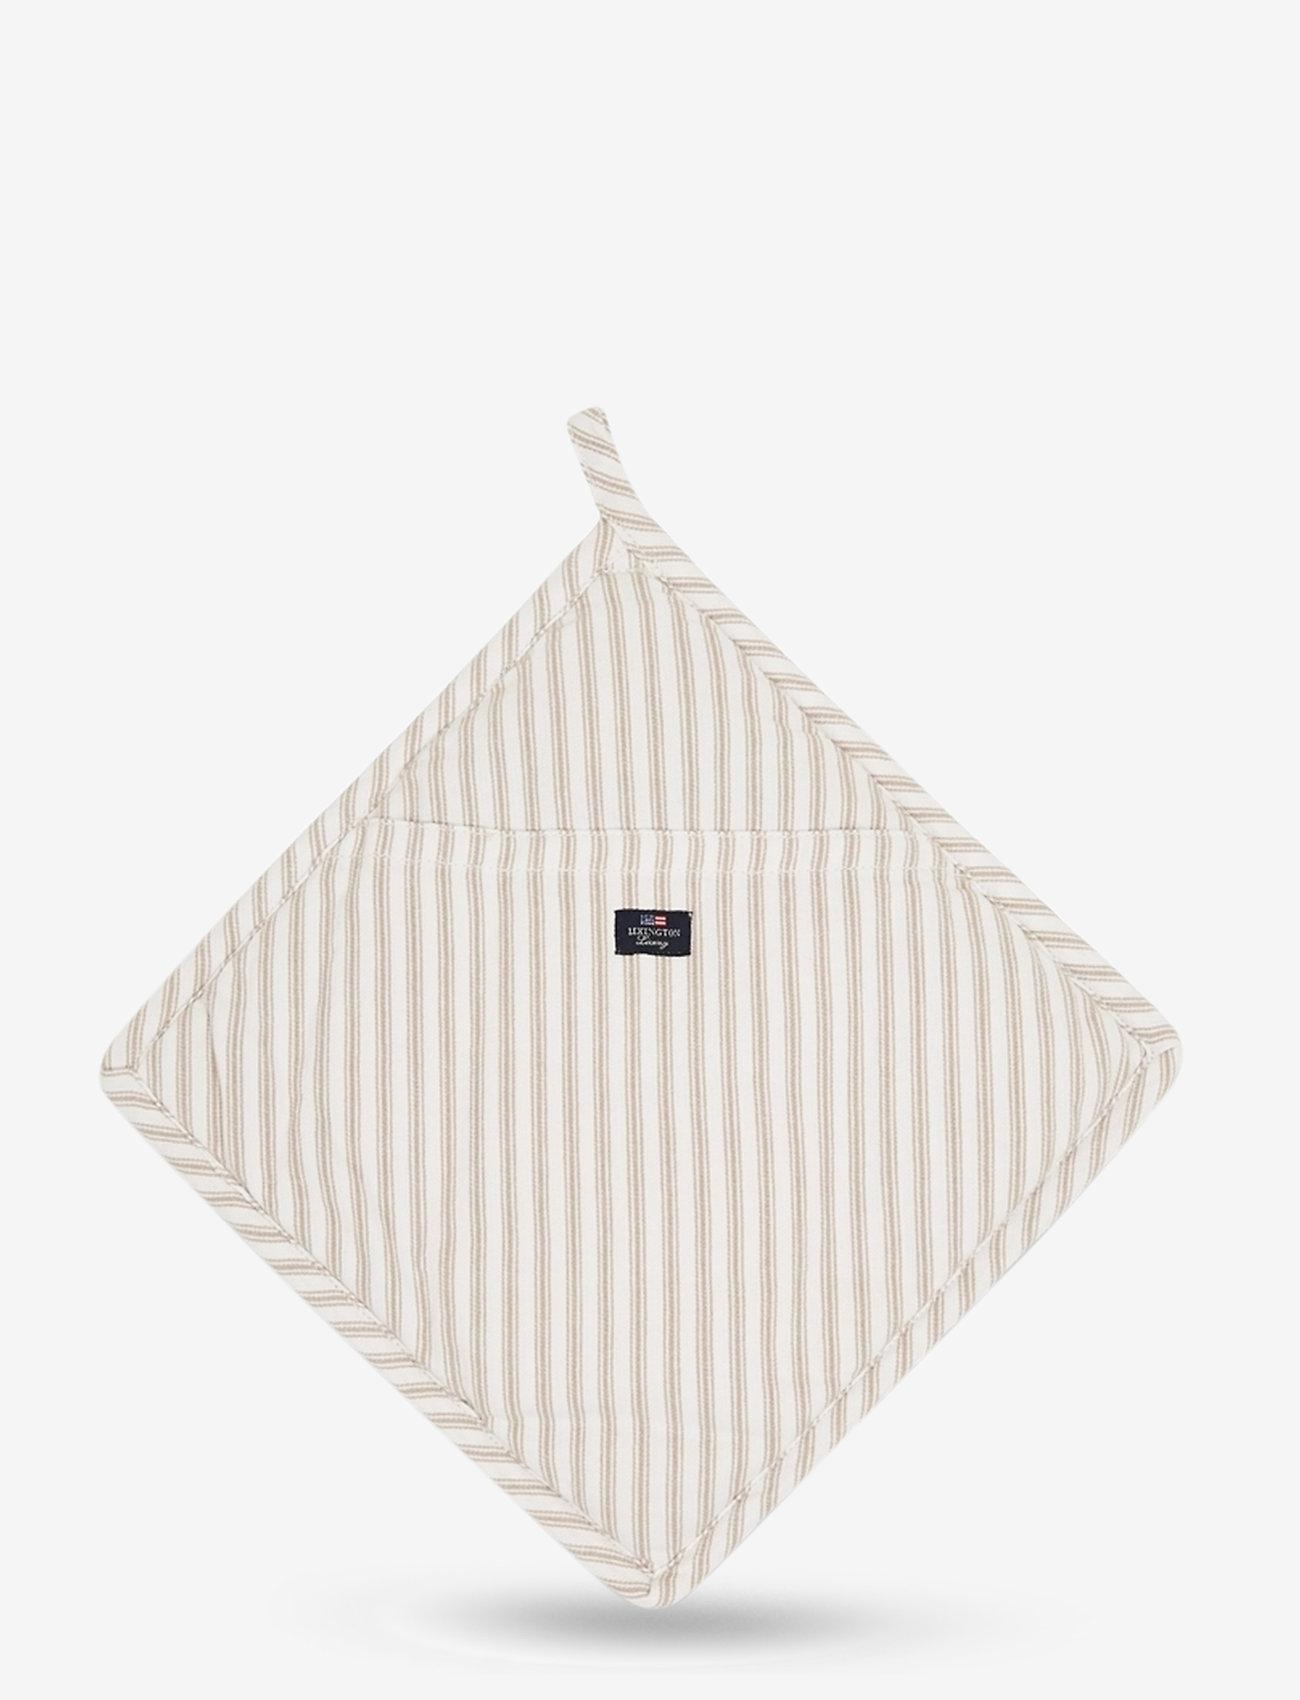 Lexington Home - Icons Cotton Herringbone Striped Potholder - pannulaput ja patakintaat - beige/white - 0